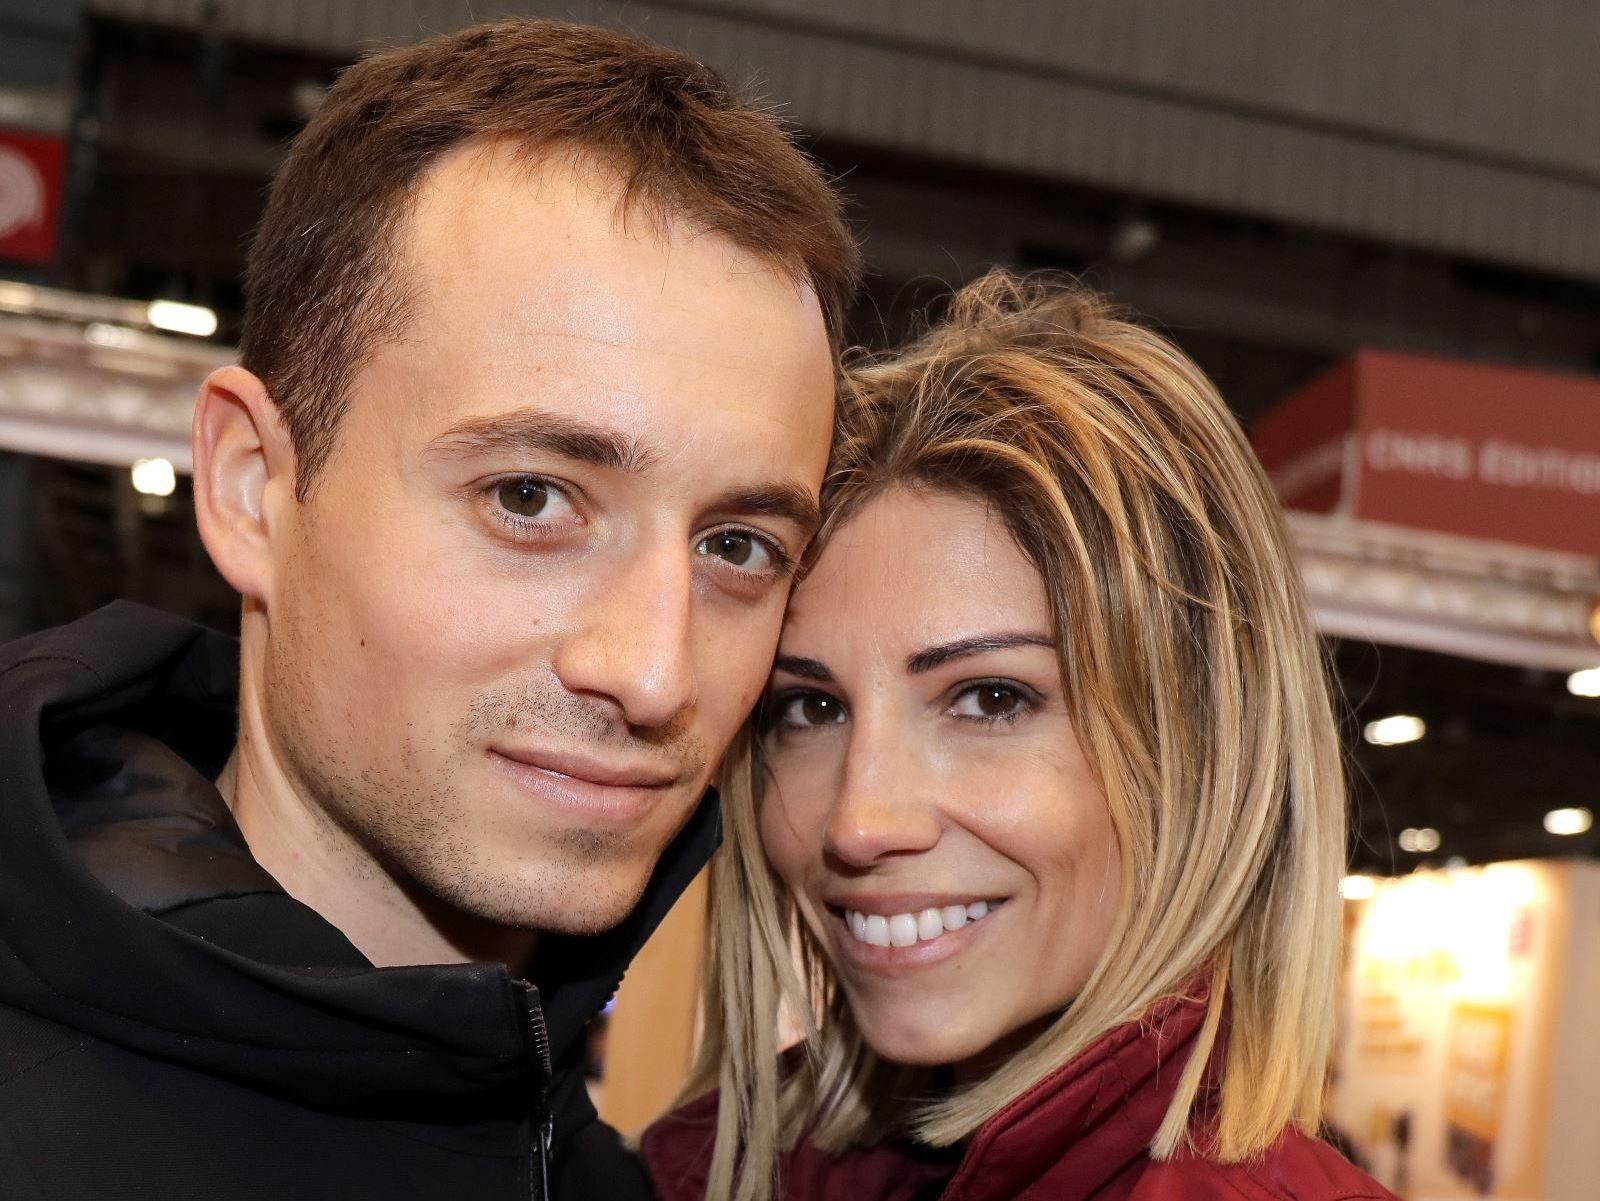 Rencontre femme russe photo